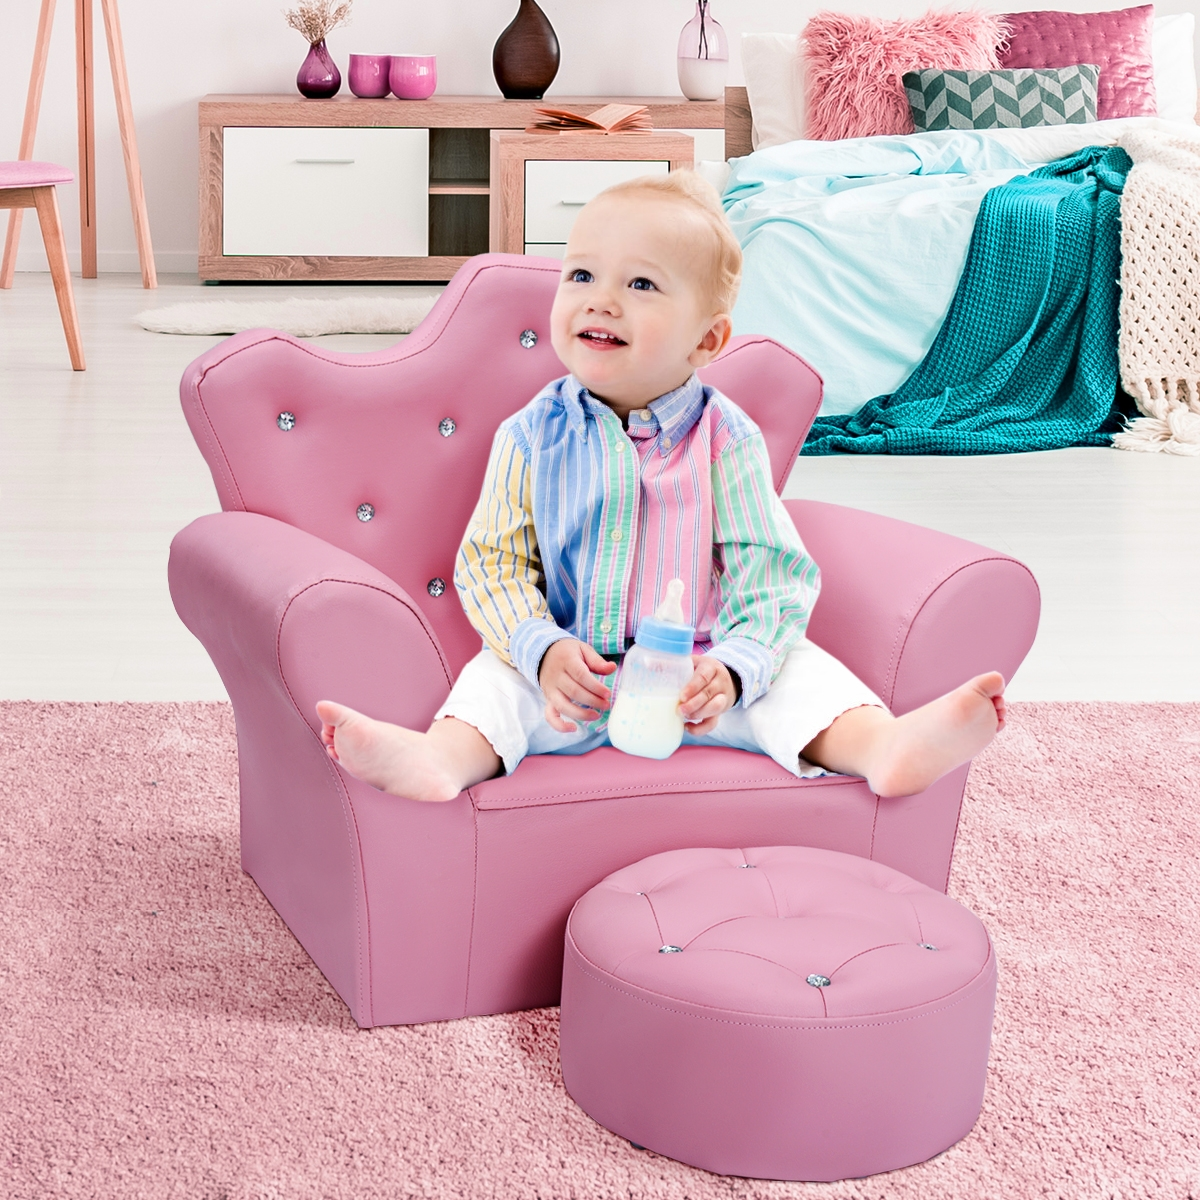 Sofá Infantil con Reposapiés Sofá para Niños Sofá Princesa Acolchada 58 x 31 x 49 cm Rosa